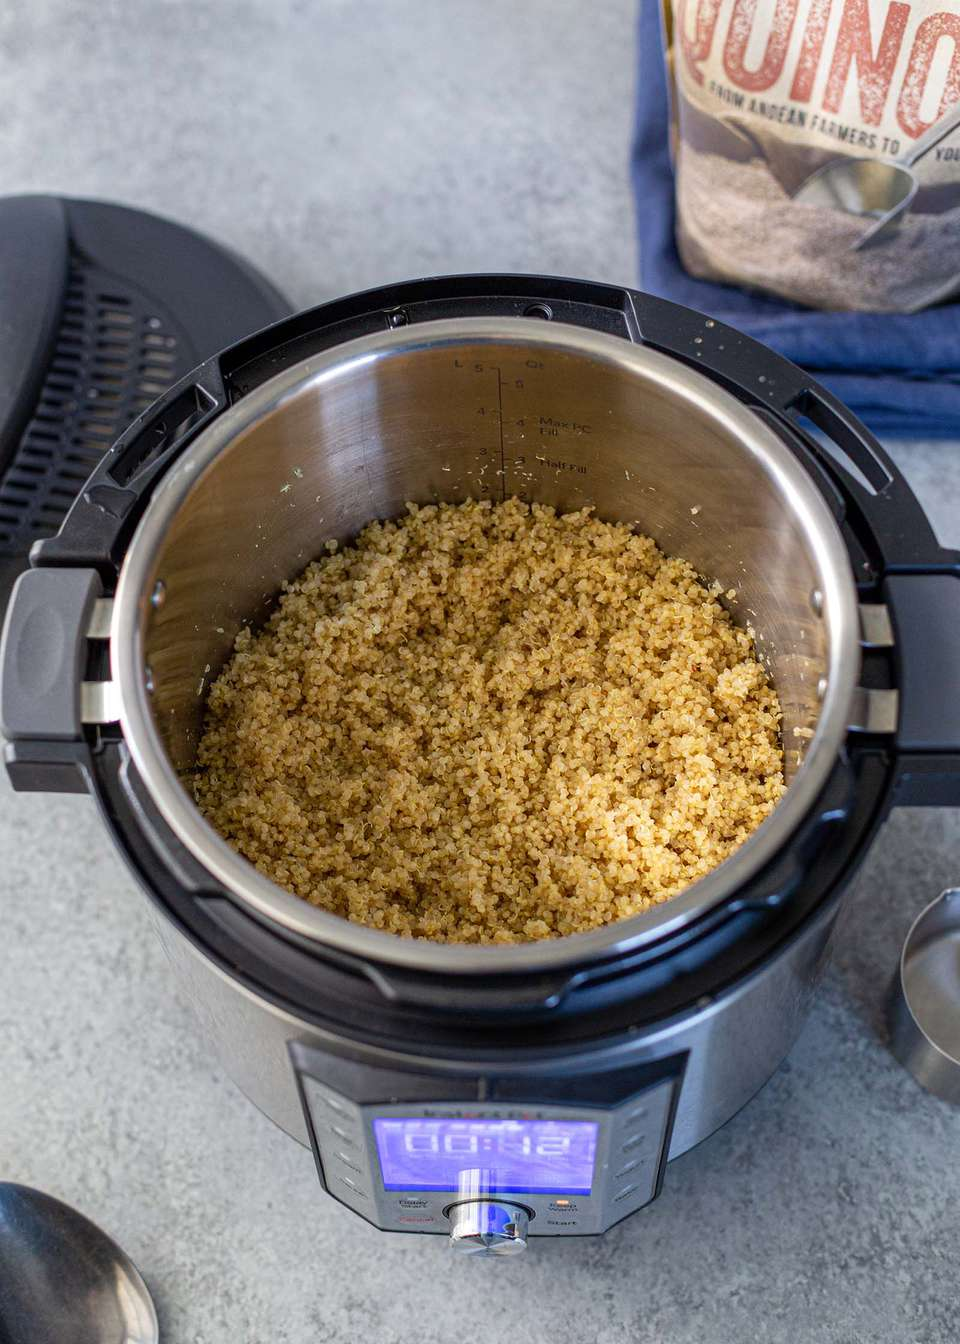 Pot of cooked quinoa in Instant Pot